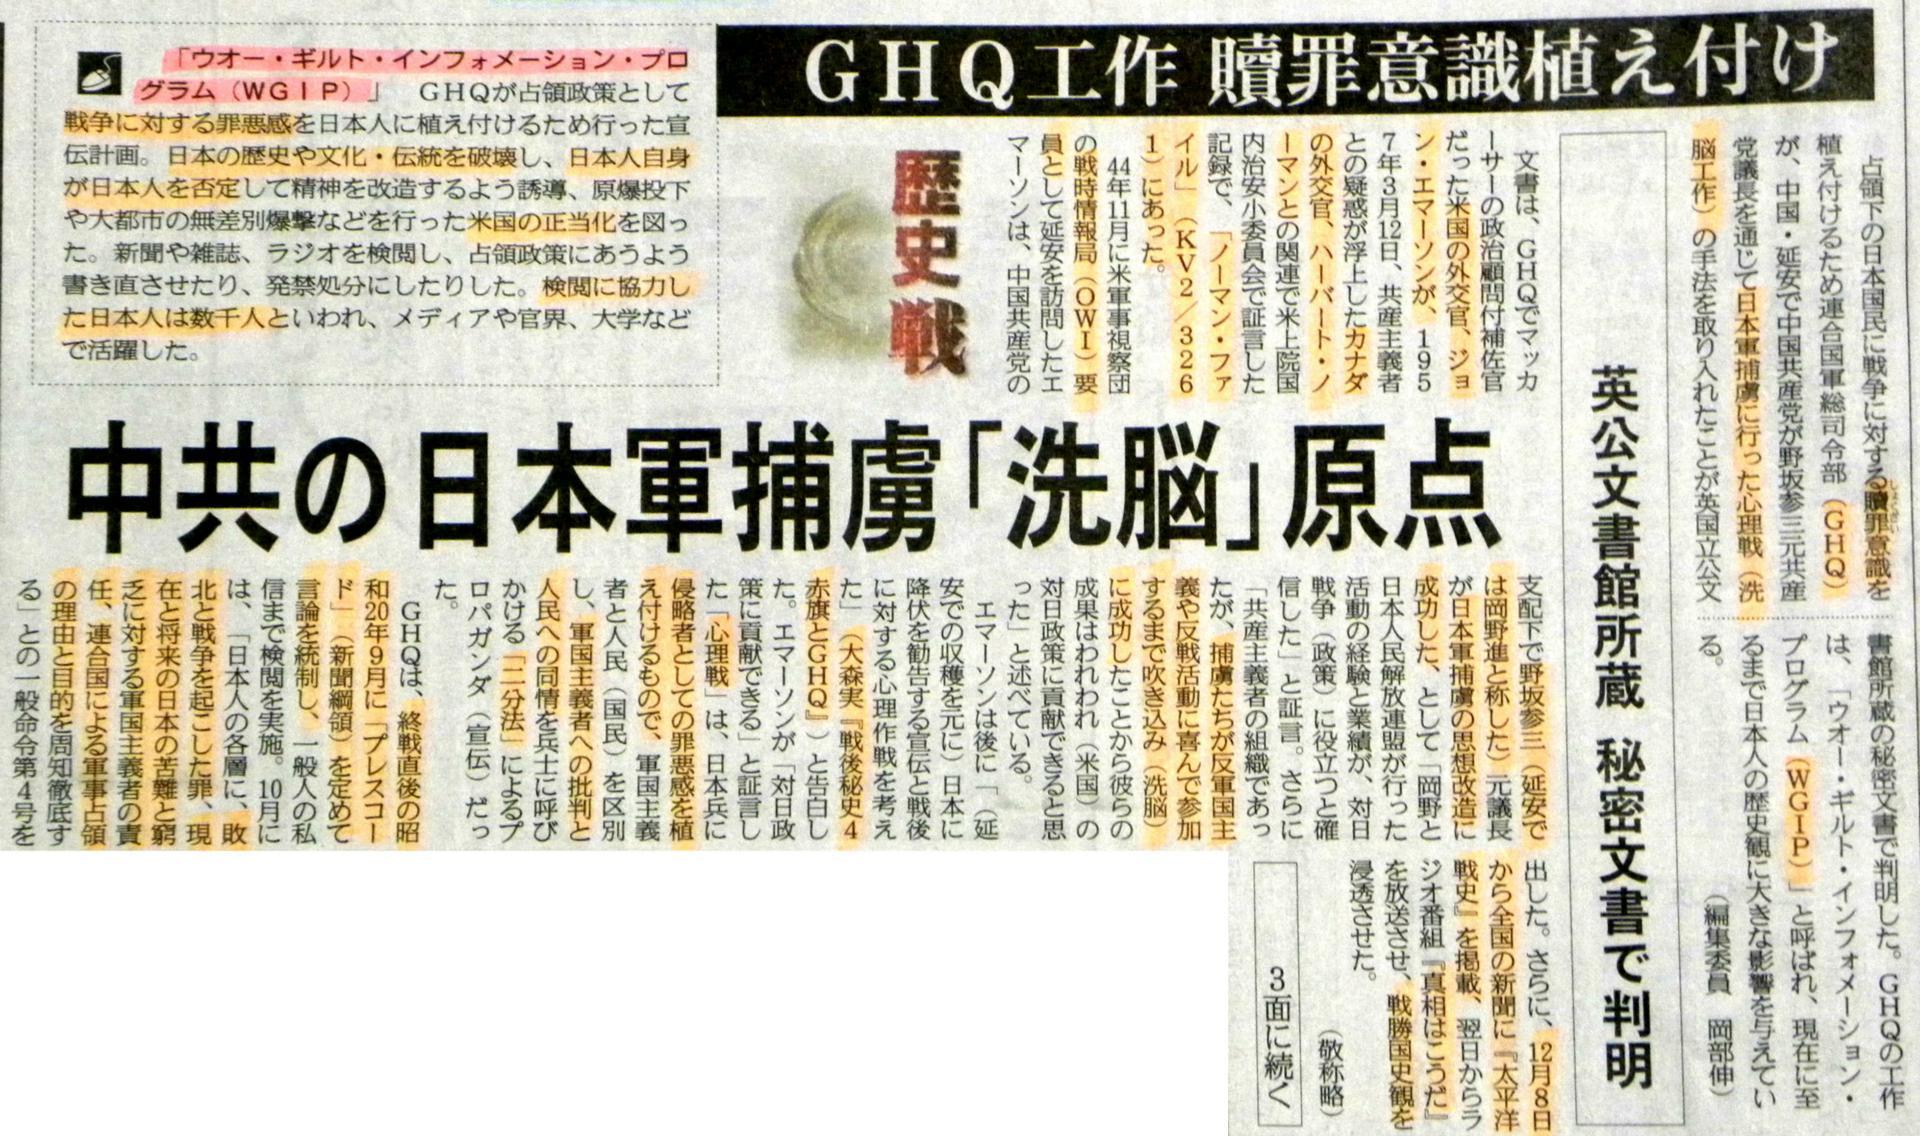 GHQ工作 贖罪意識植え付け 産経記事